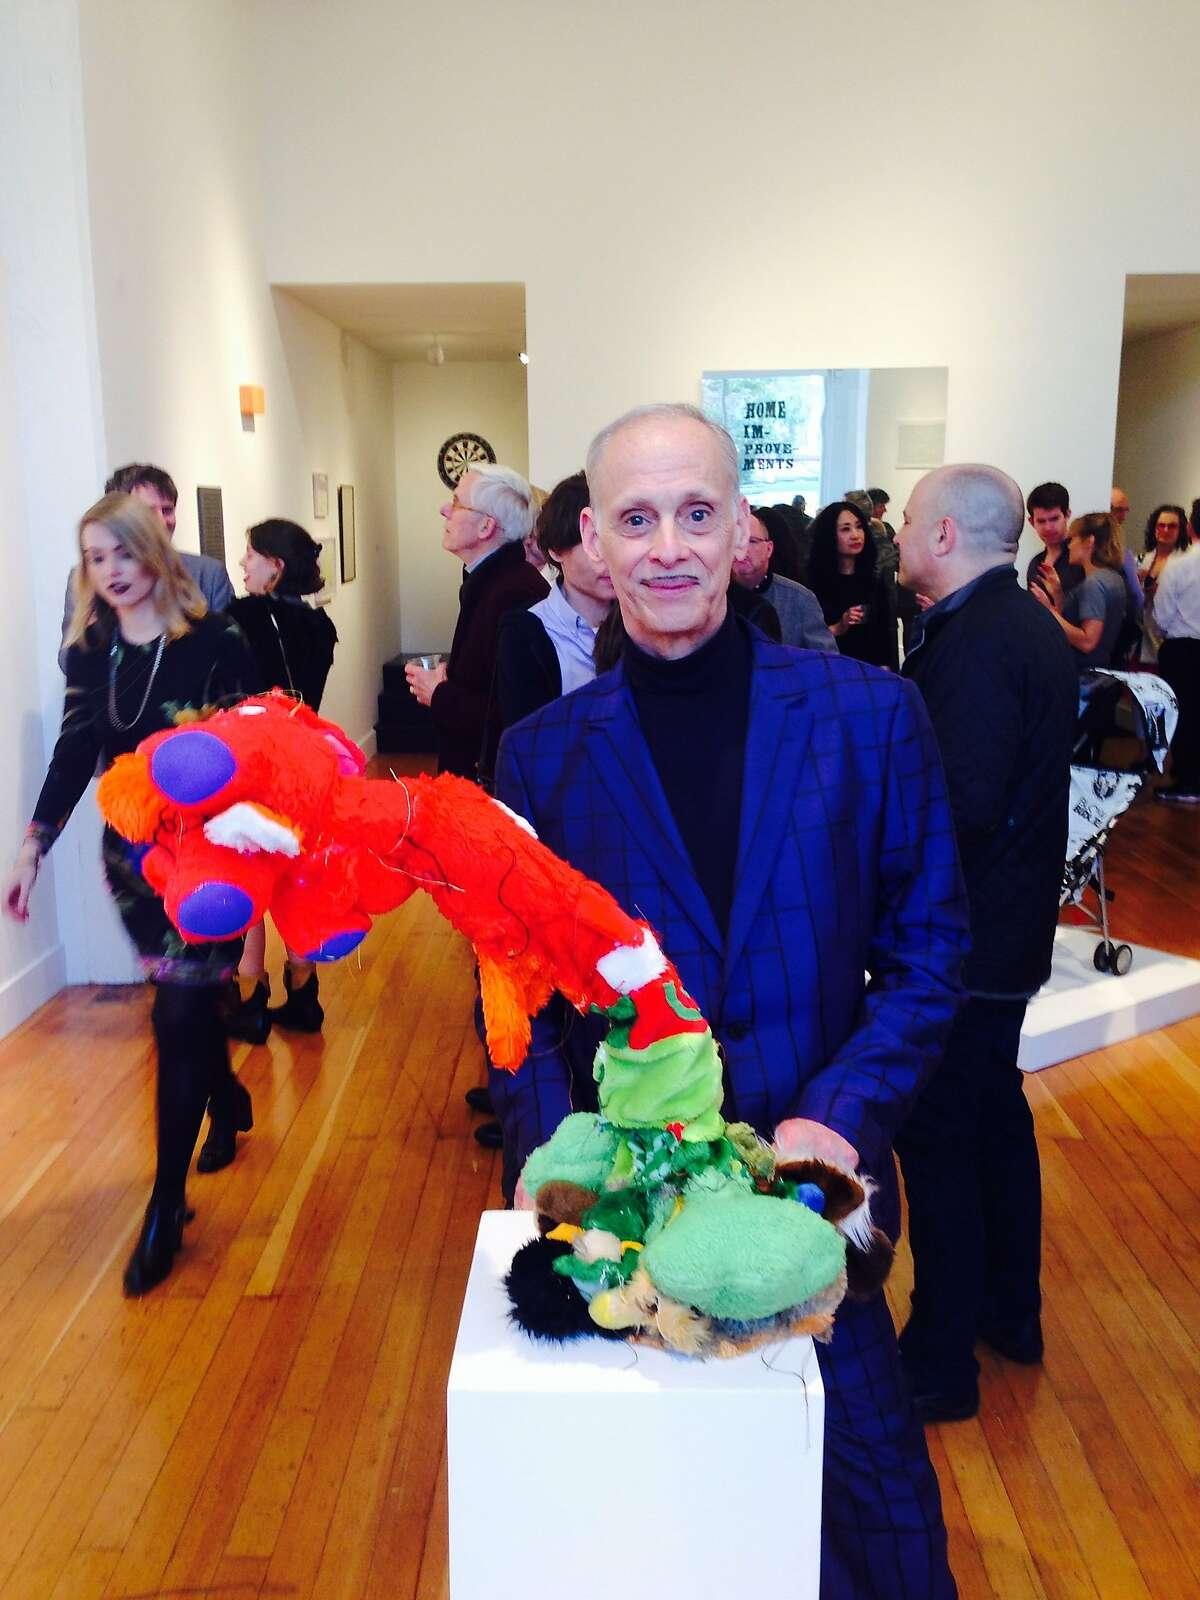 John Waters, the filmmaker and curator of FraenkelLab's inaugural show